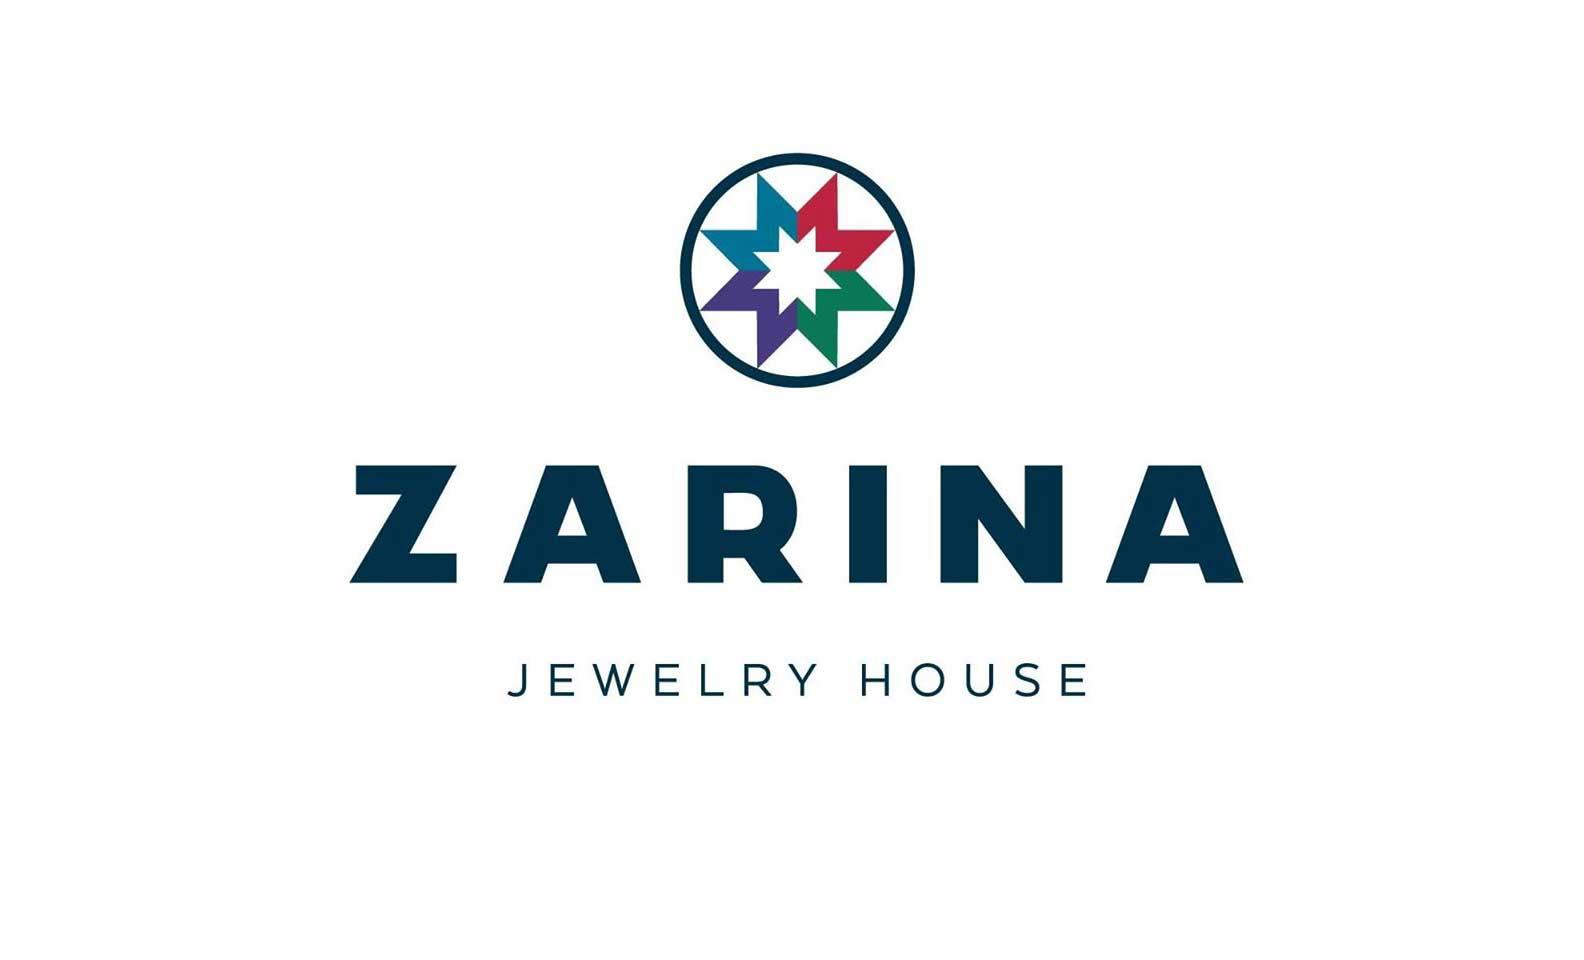 zarina - Secrets of Jewellery World